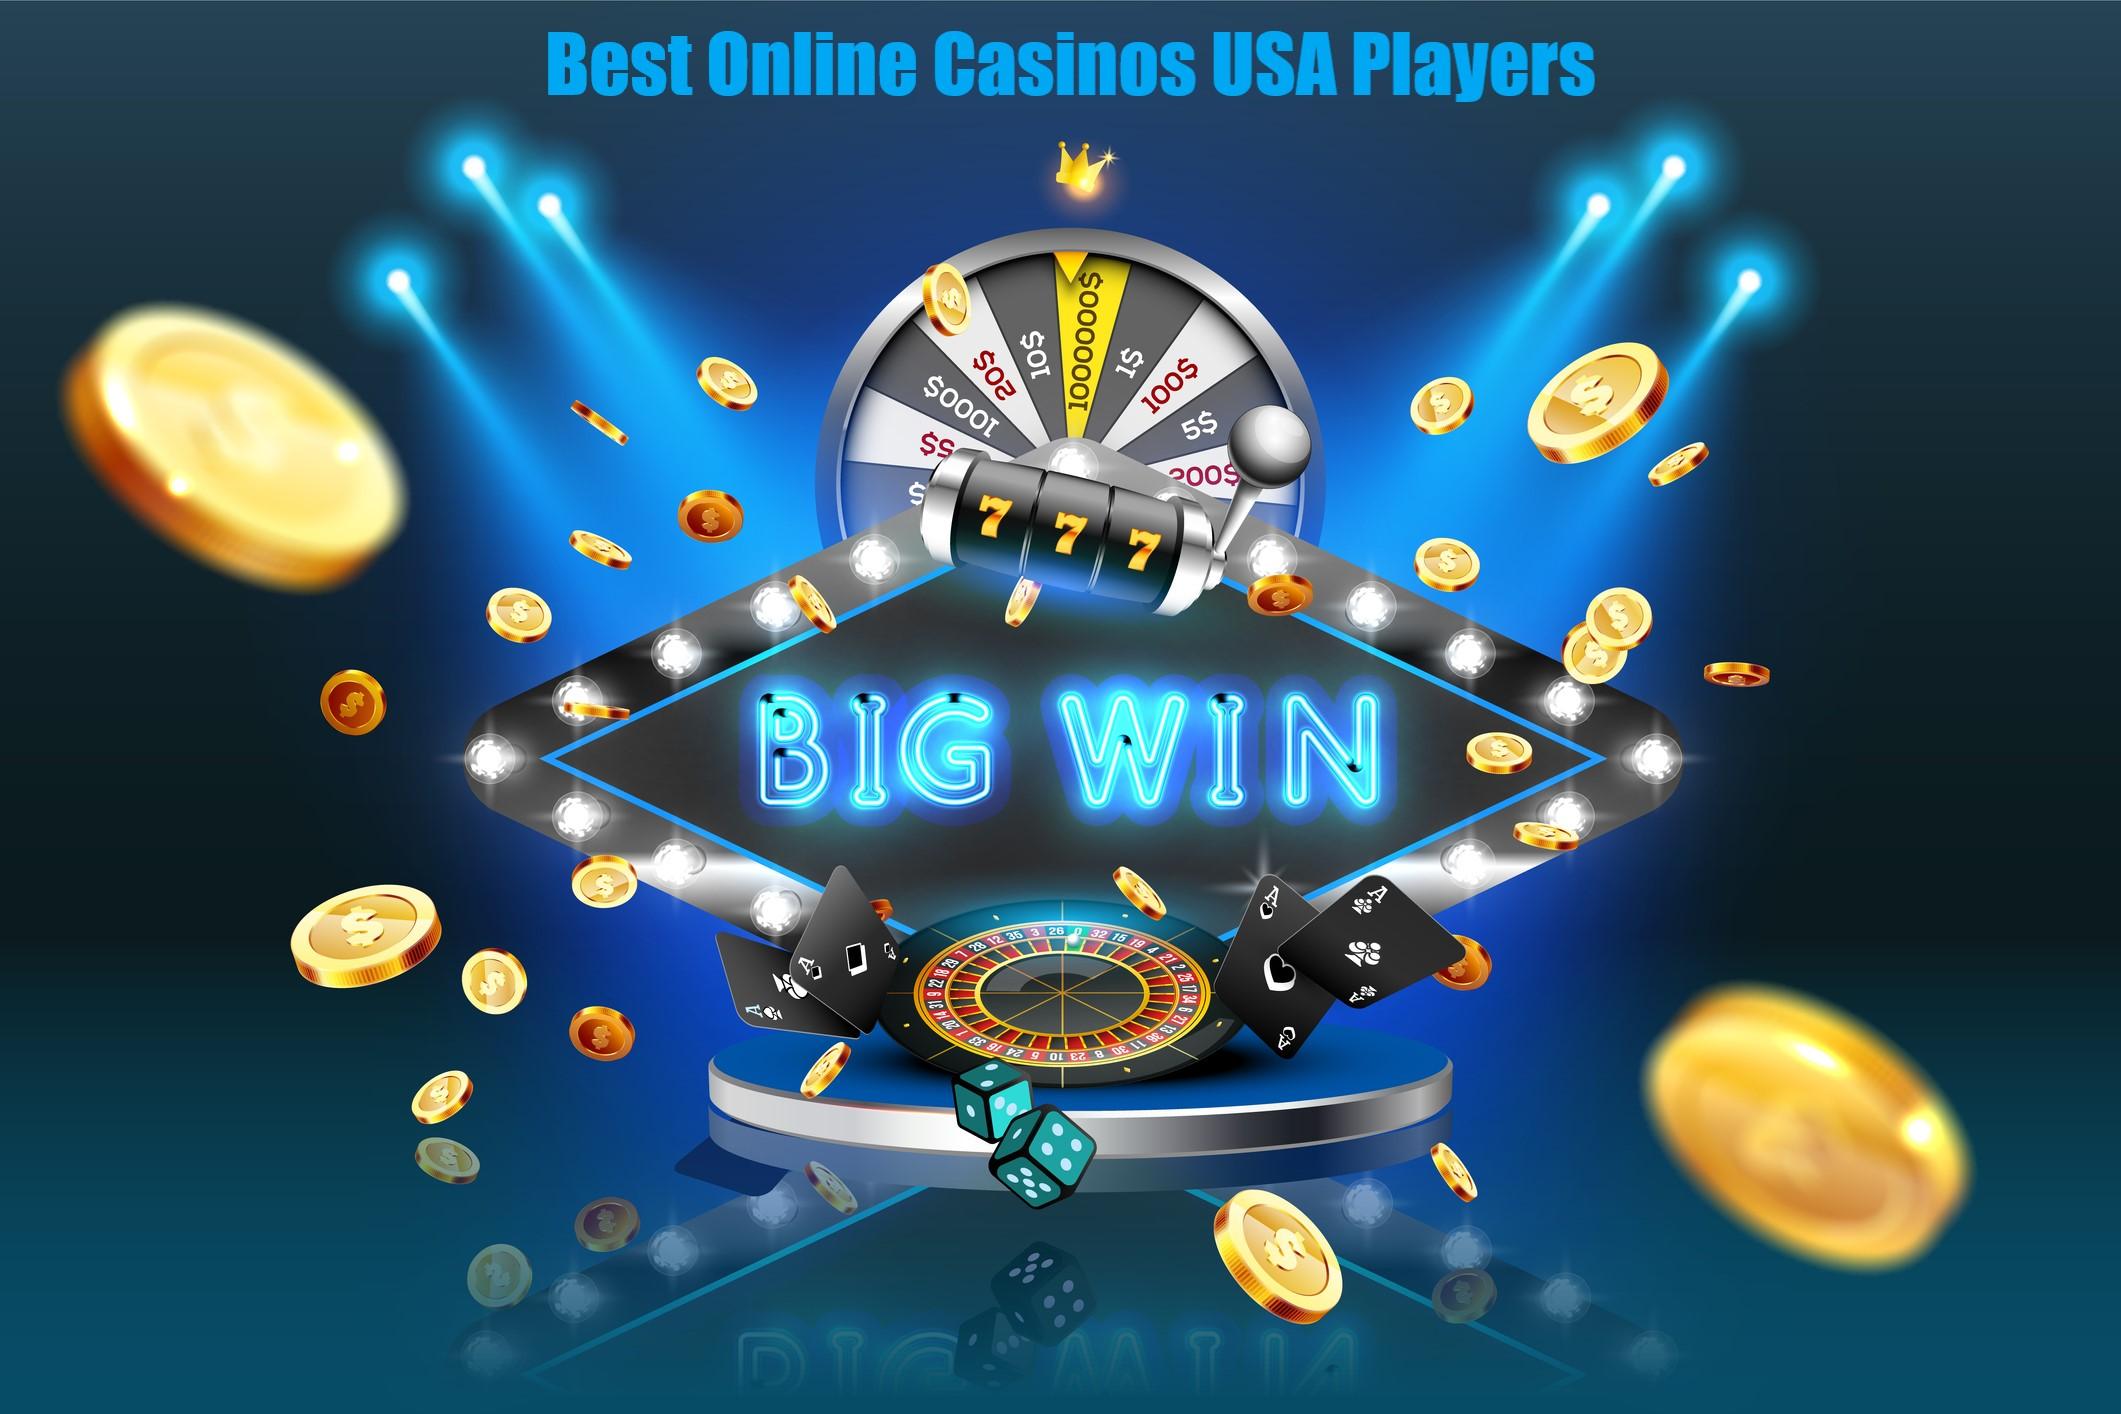 SlotMachinesUS.com – Best Online Casinos USA Players